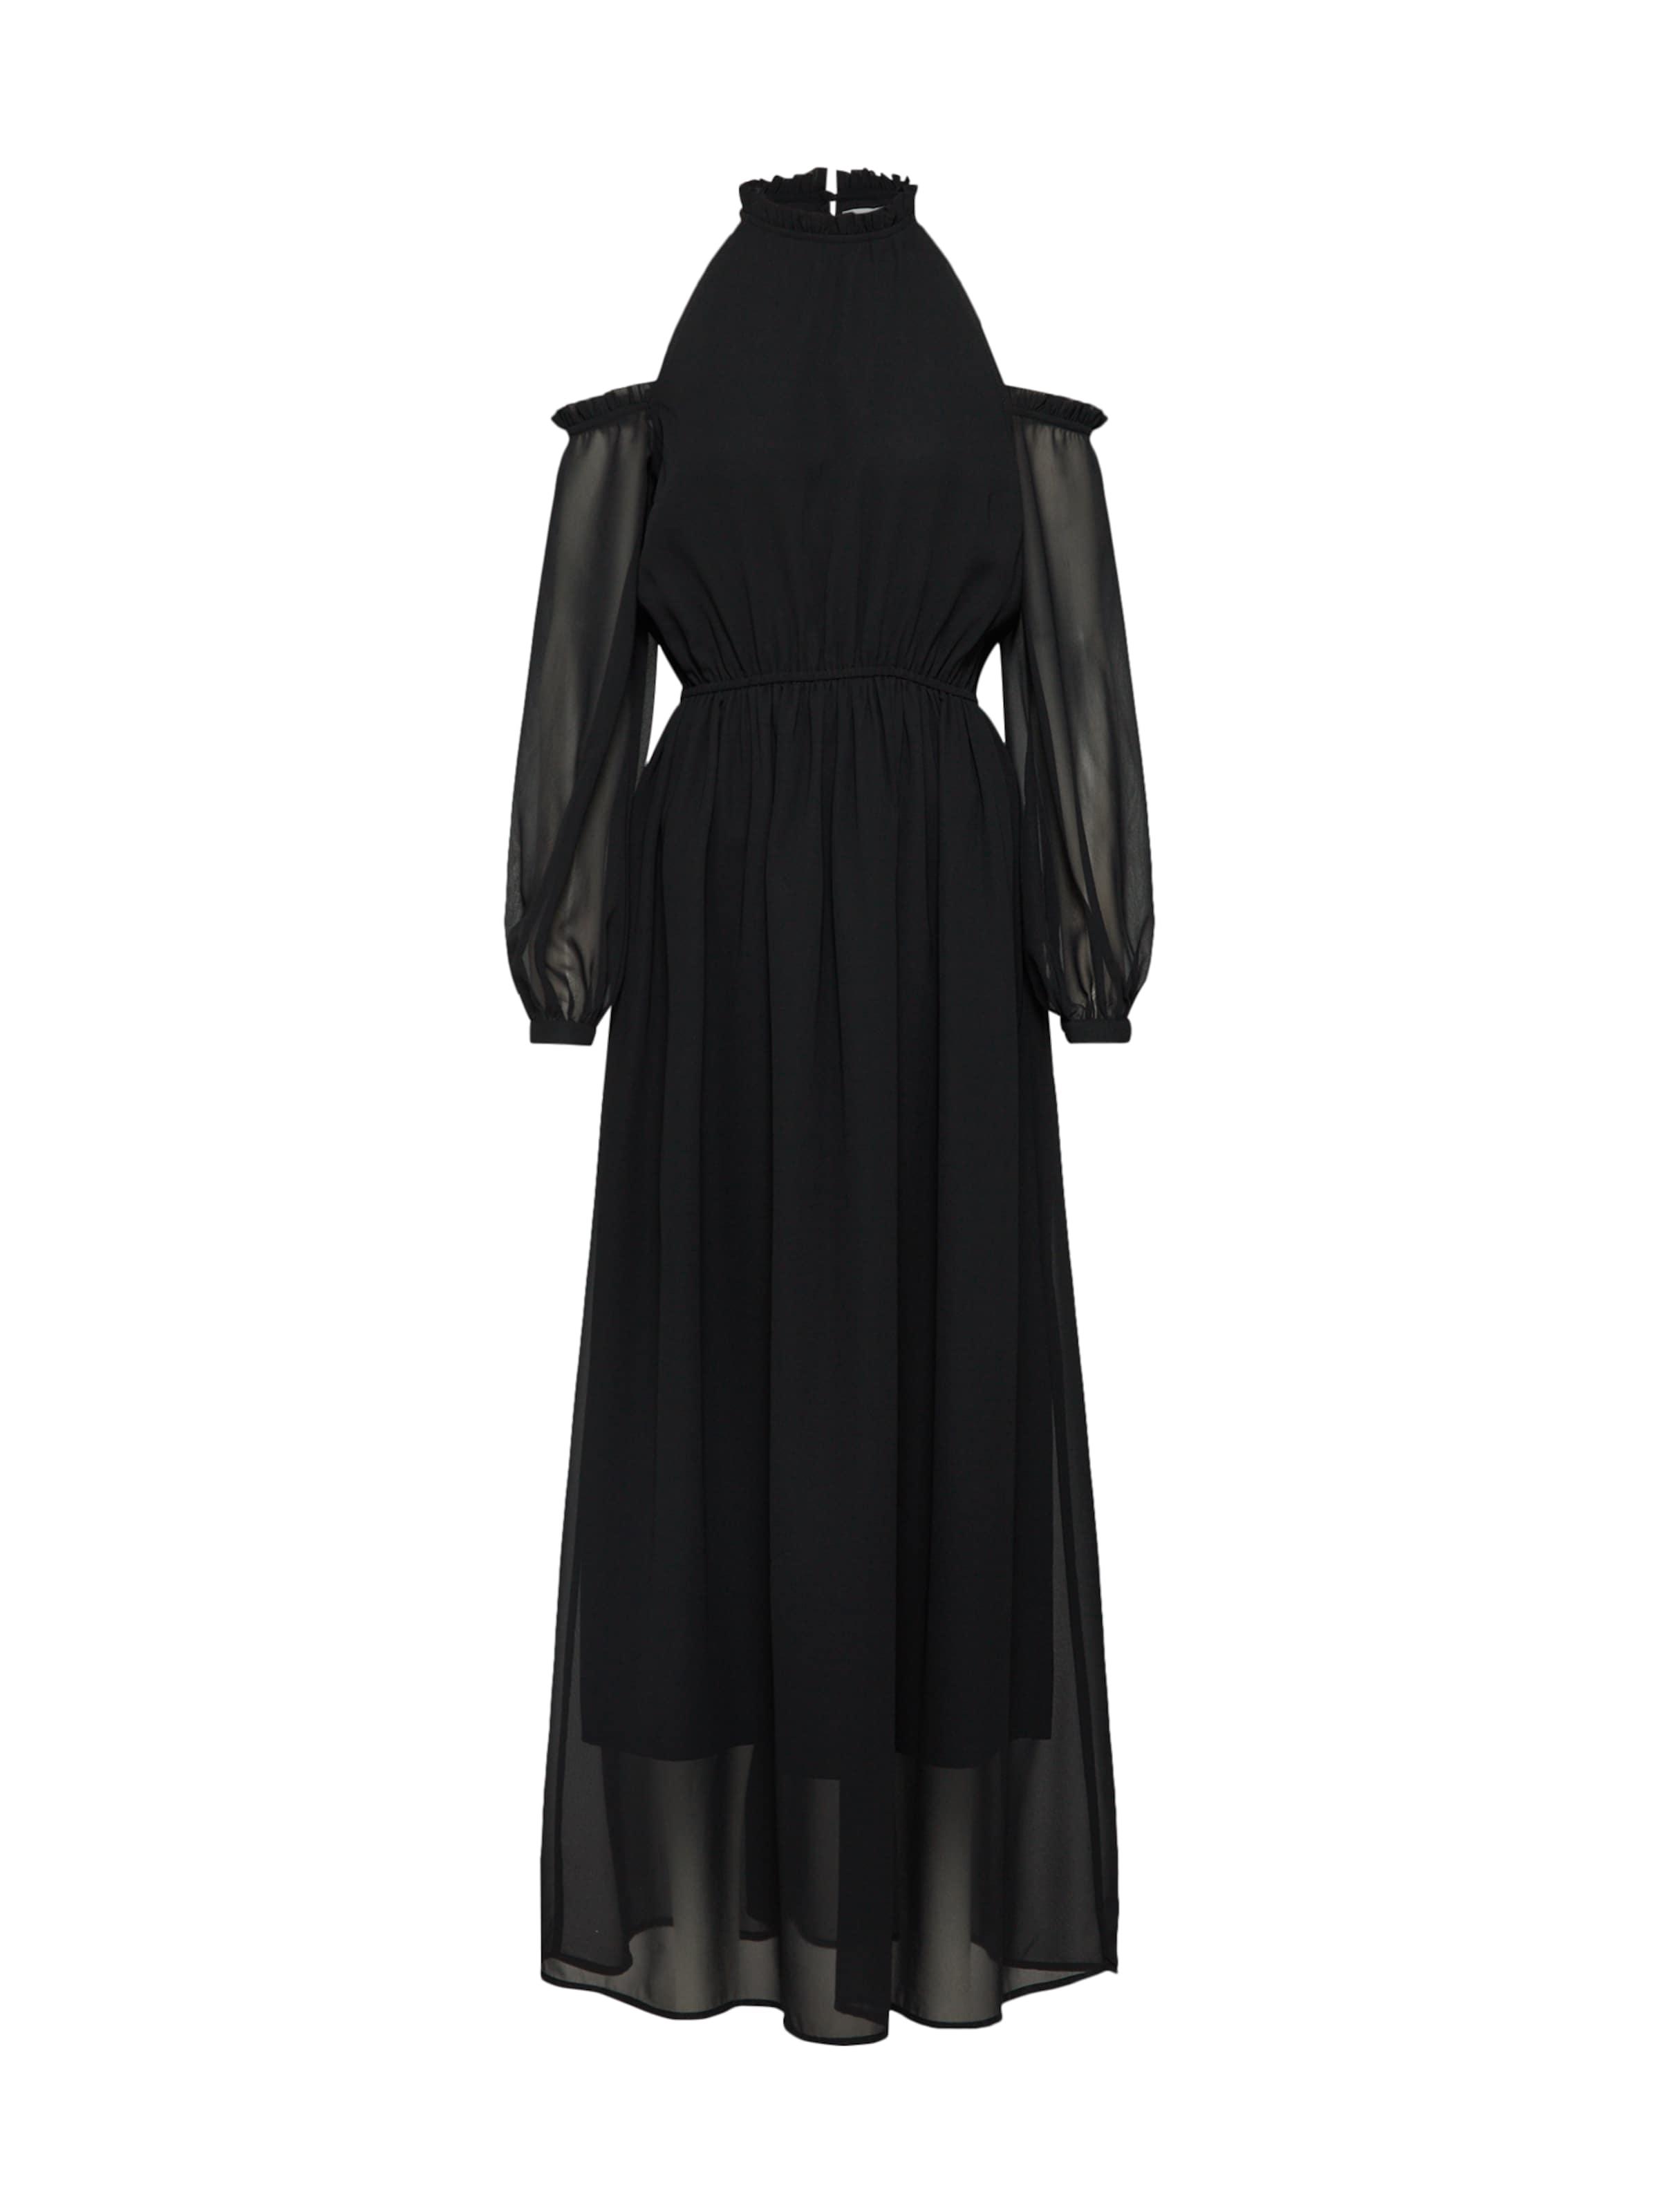 Maxi En kd 'cold Noir Na Chiffon Shoulder Robe Dress' pLGSUVqMz